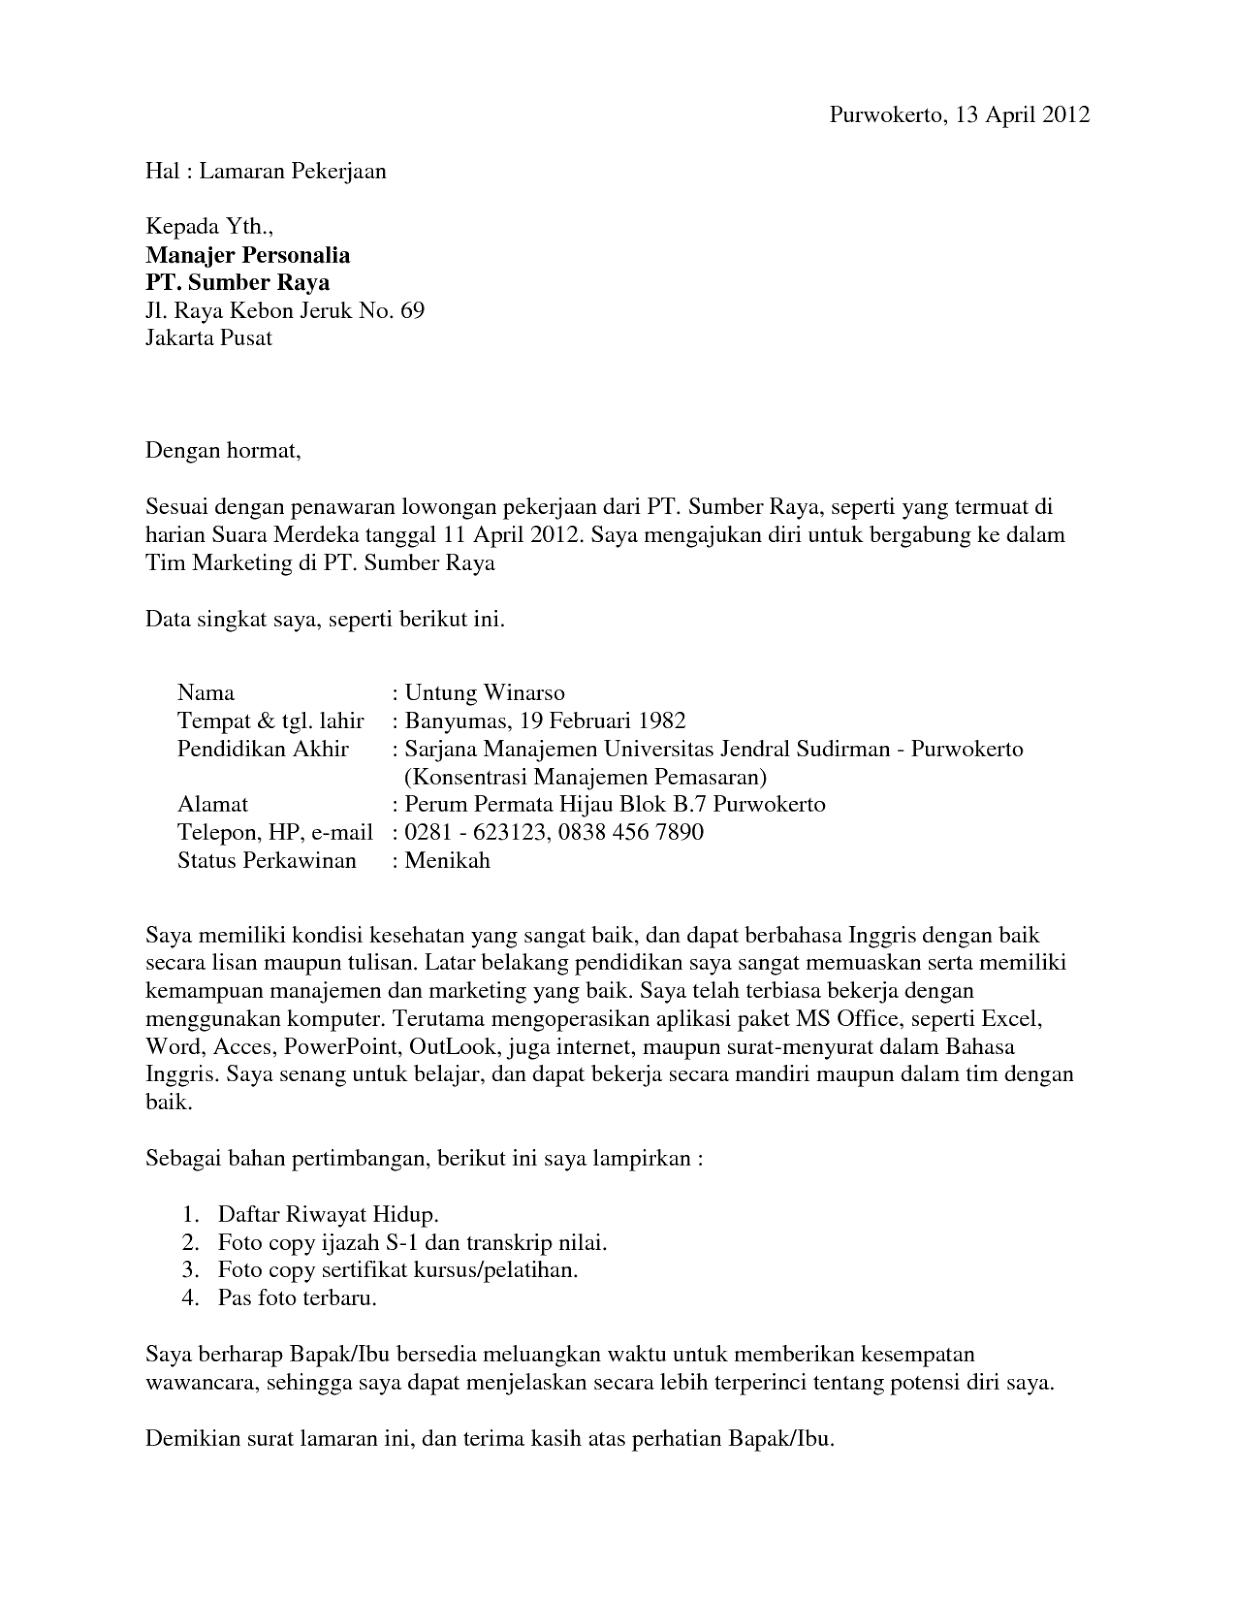 Research paper grading matrix